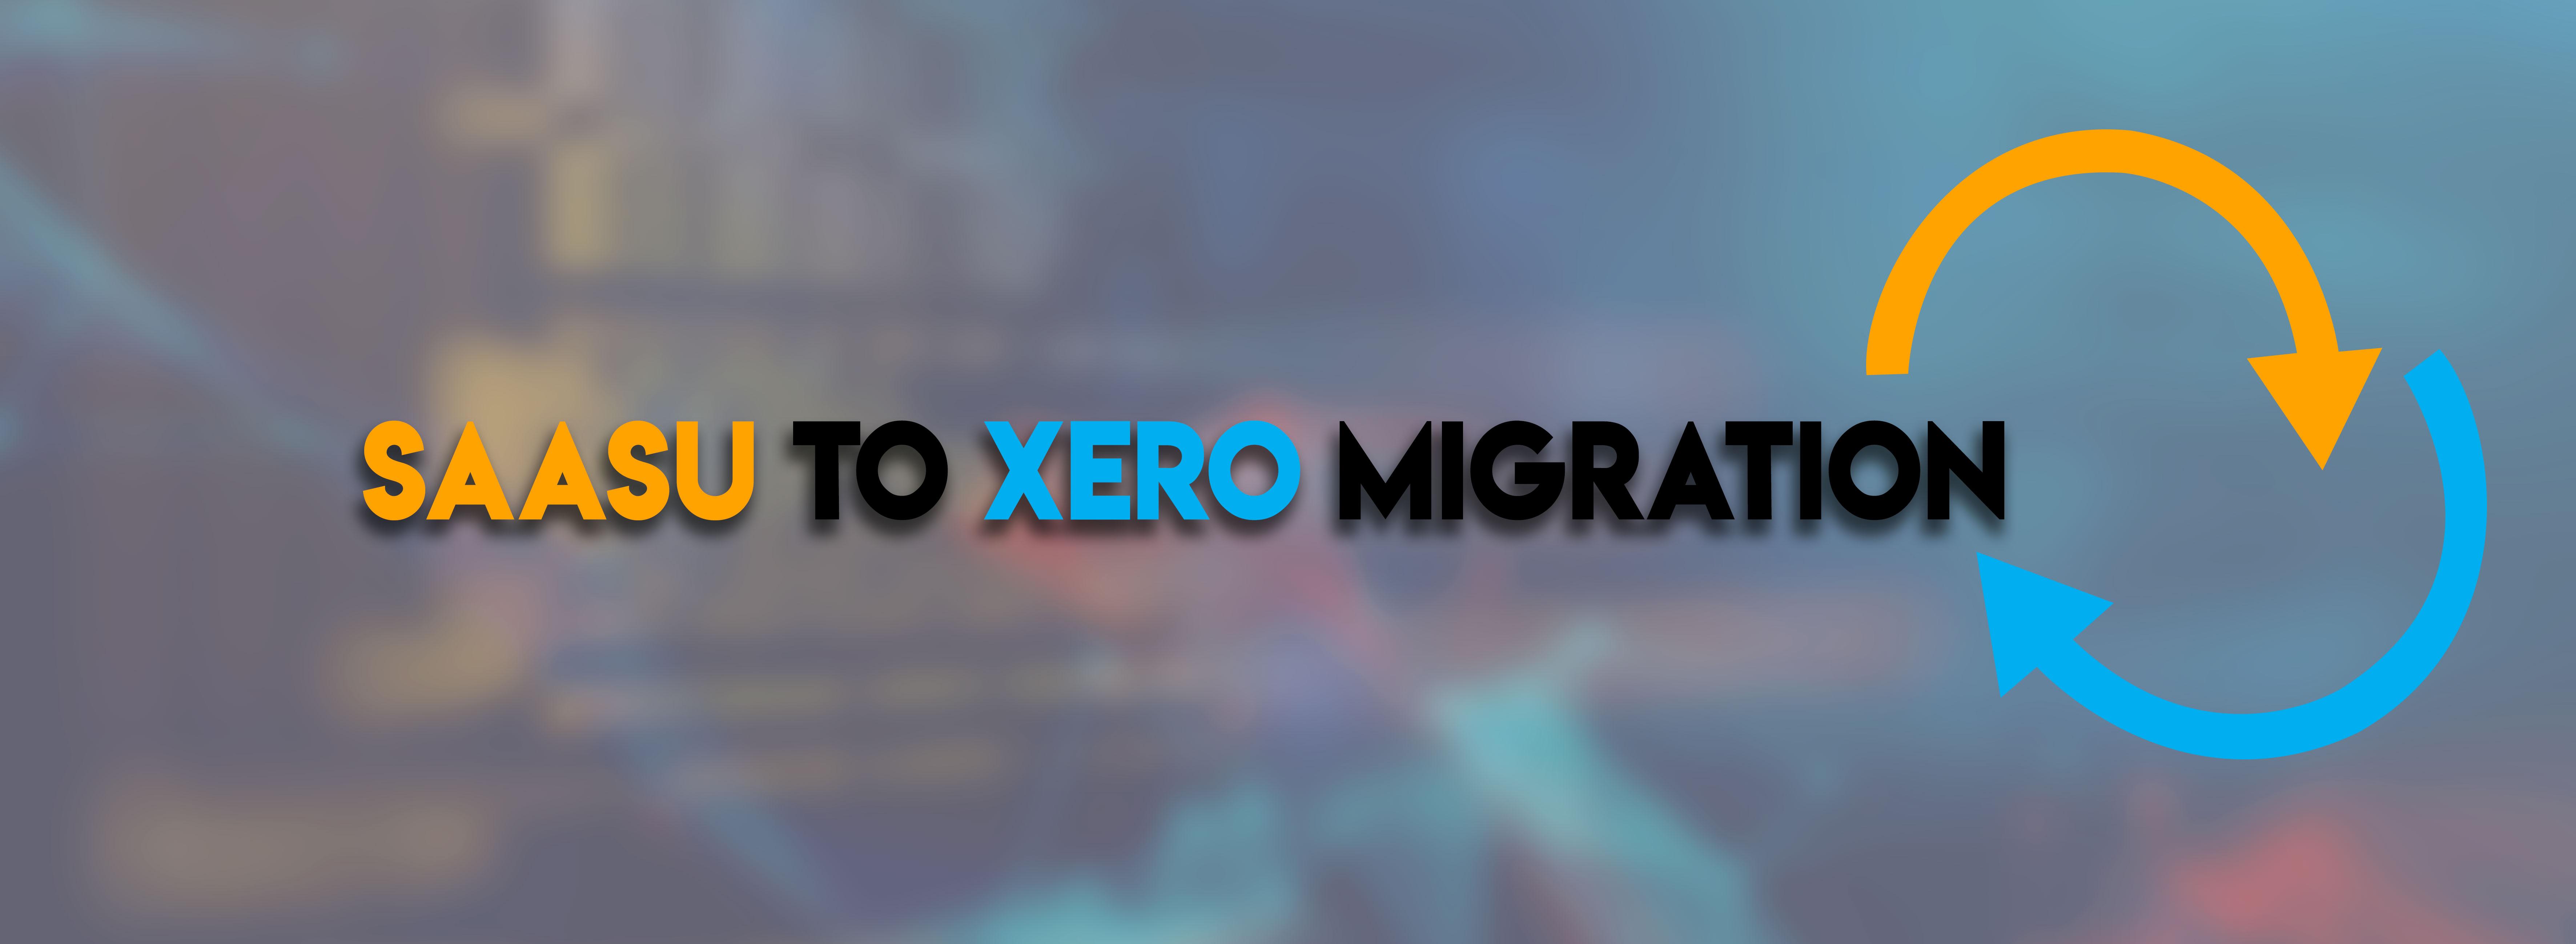 SAASU to XERO Migration